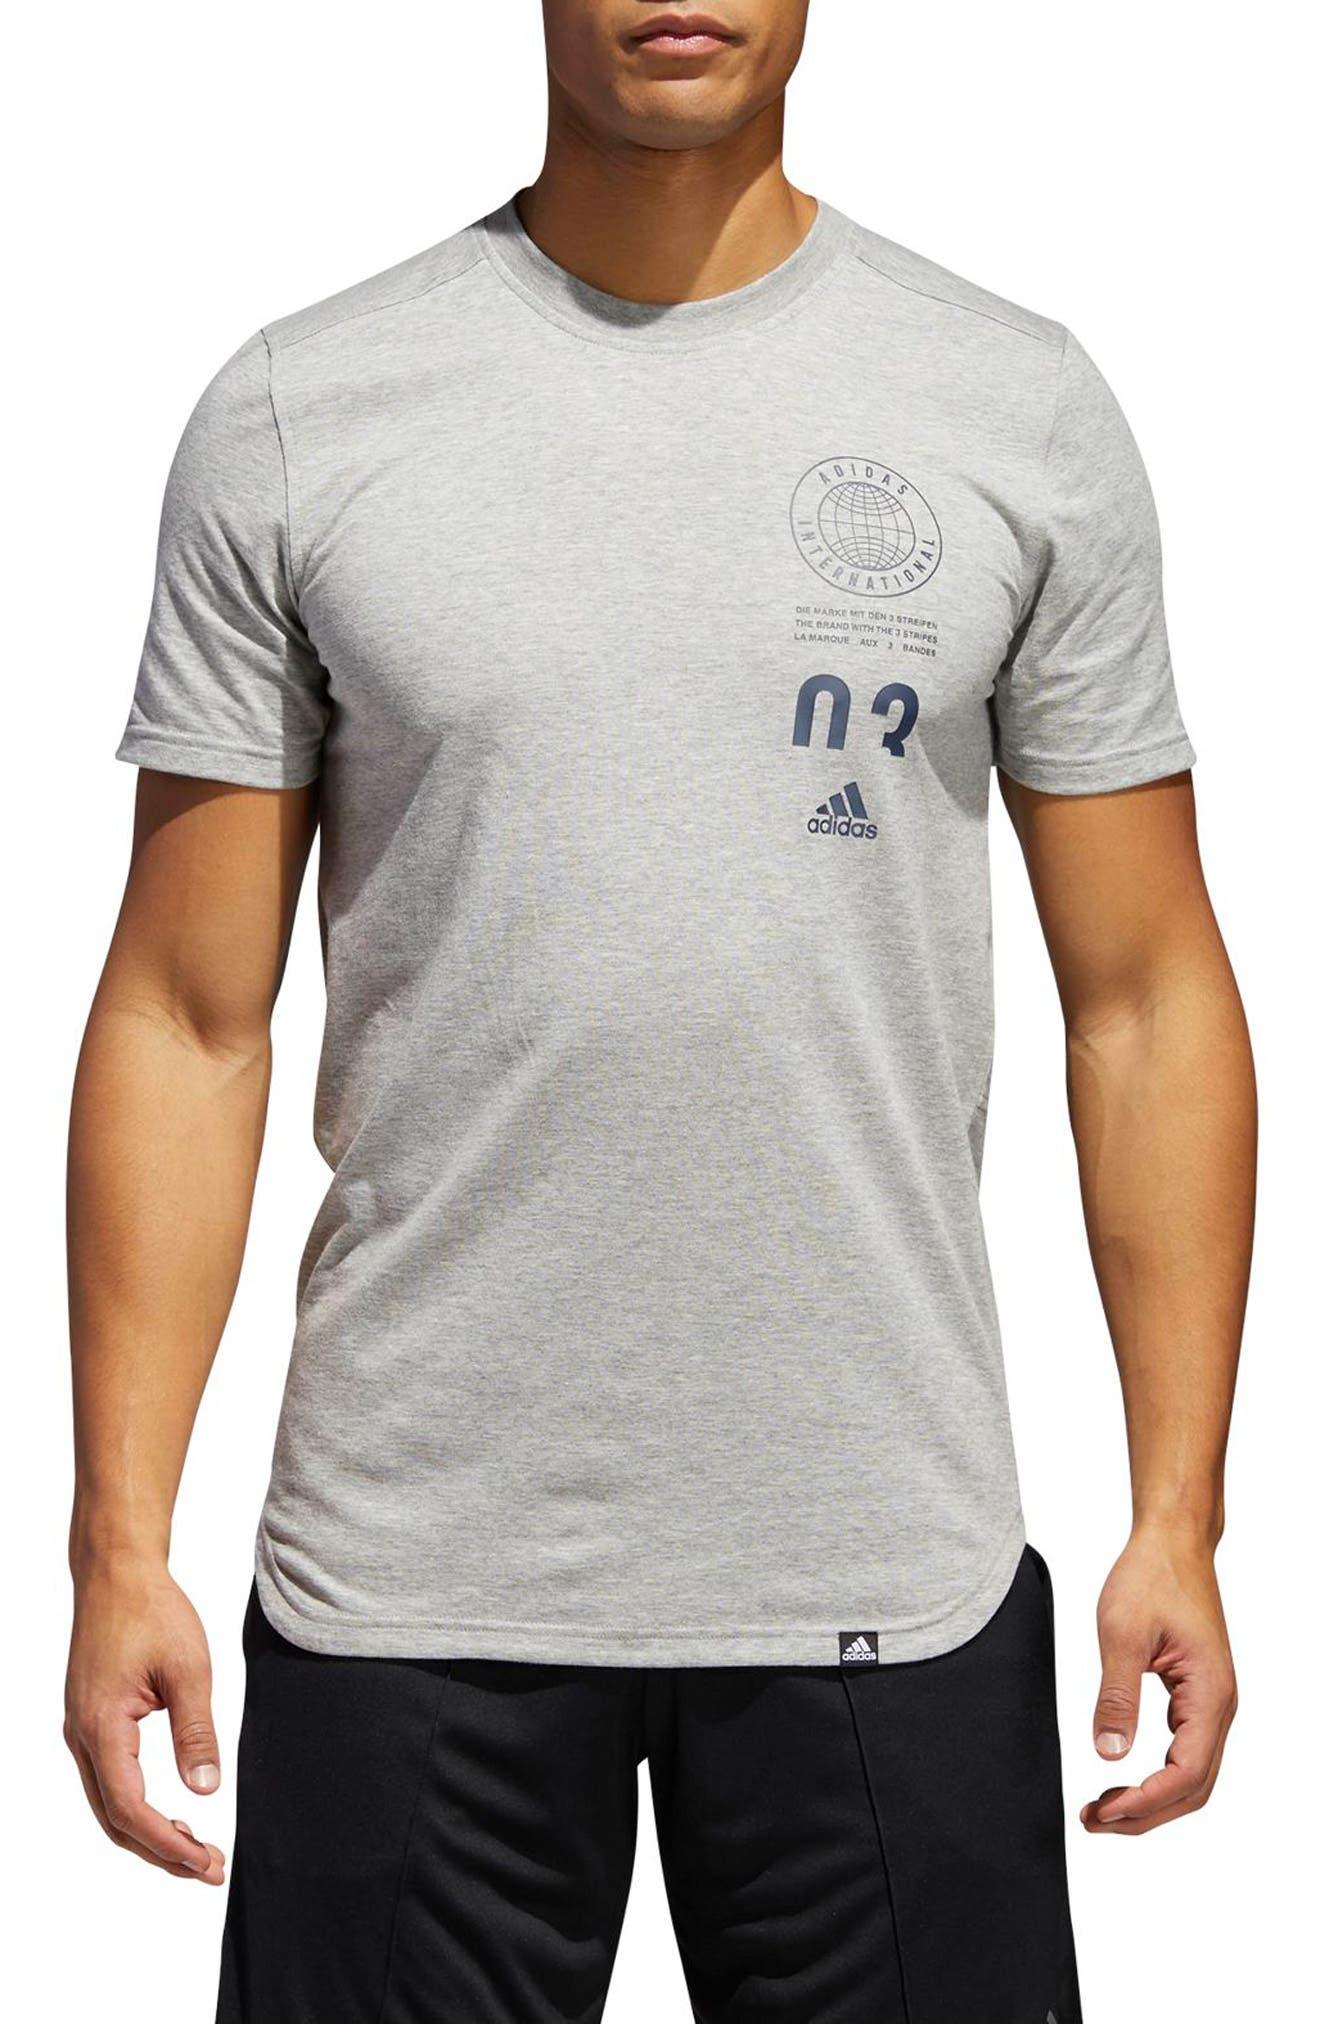 grey t shirt le adidas, pantaloni, magliette, orologi & più nordstrom